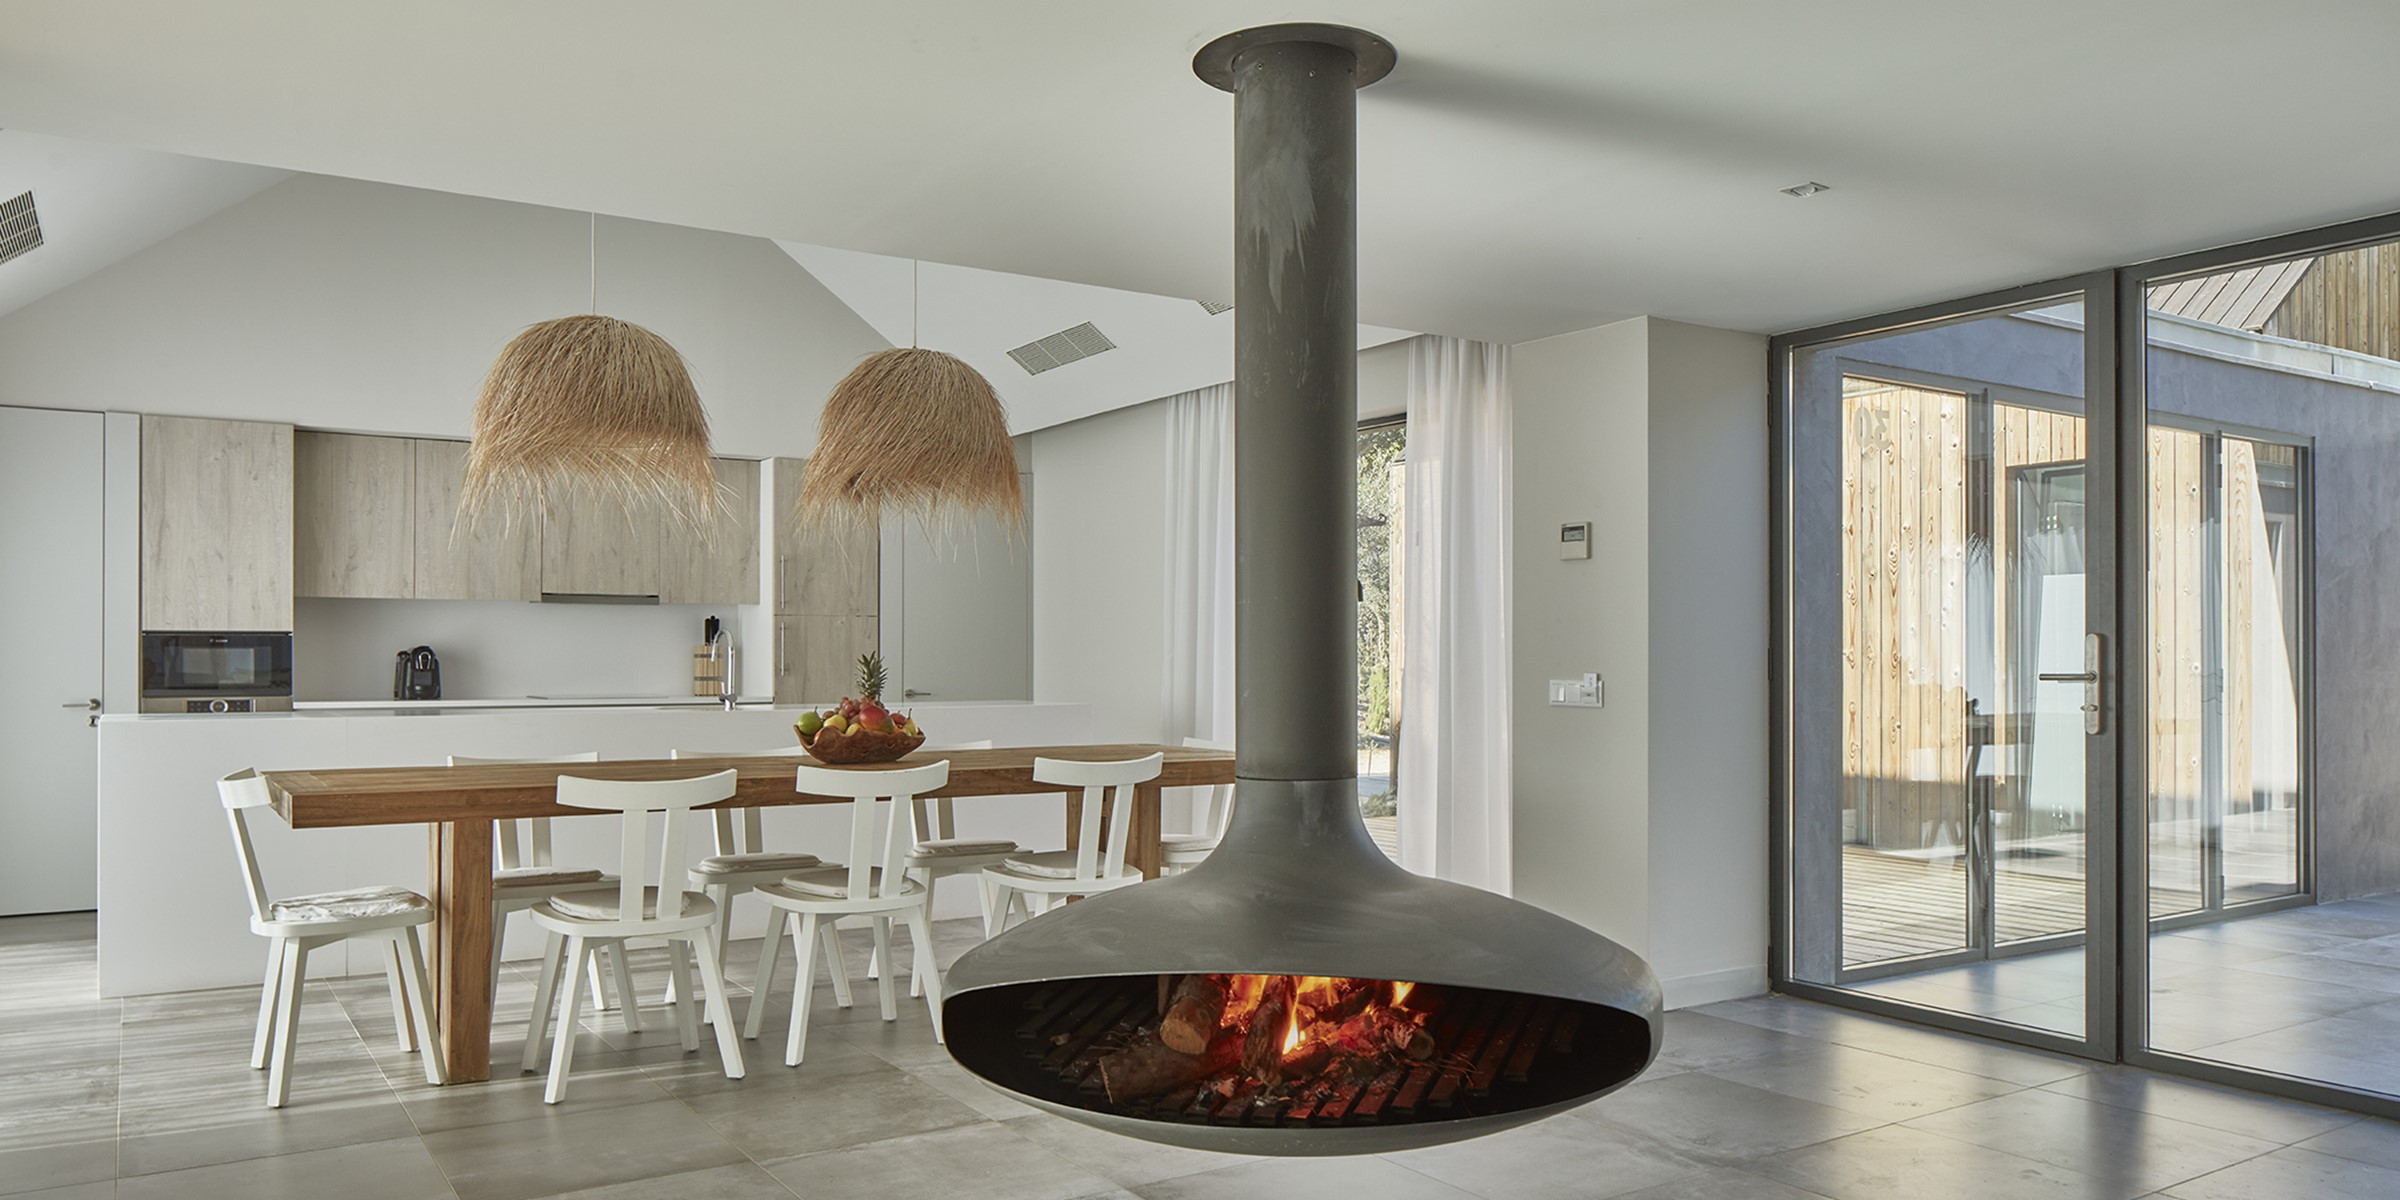 Villa Sublime Comporta Living Room With Fire Comporta 0143 LR